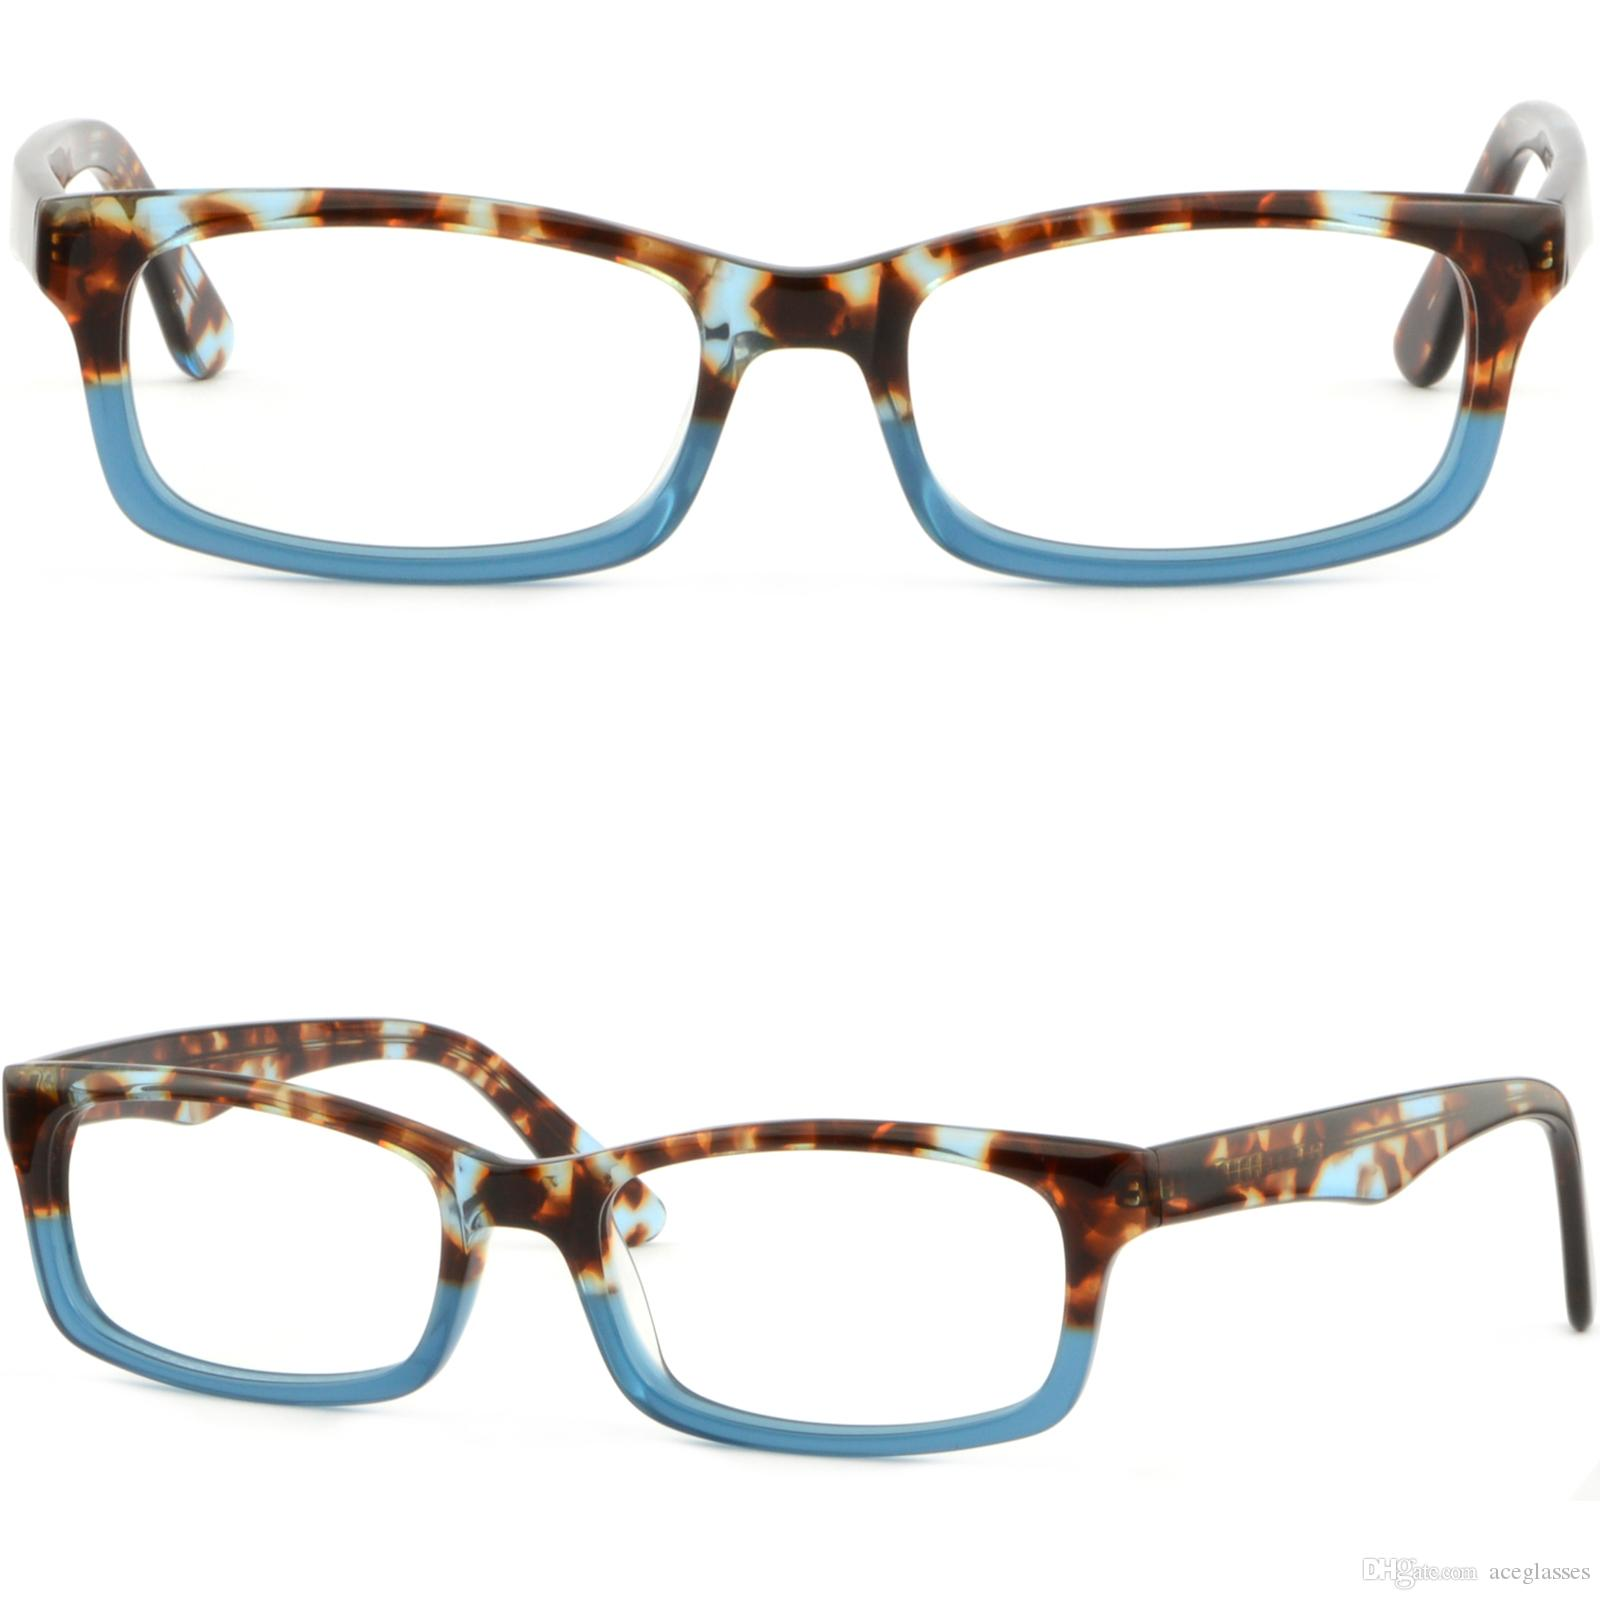 8af8fb70550 Rectangle Men S Women S Plastic Acetate Frame Prescription Glasses  Tortoiseshell Designer Eyeglass Frames Online Discontinued Eyeglass Frames  From ...